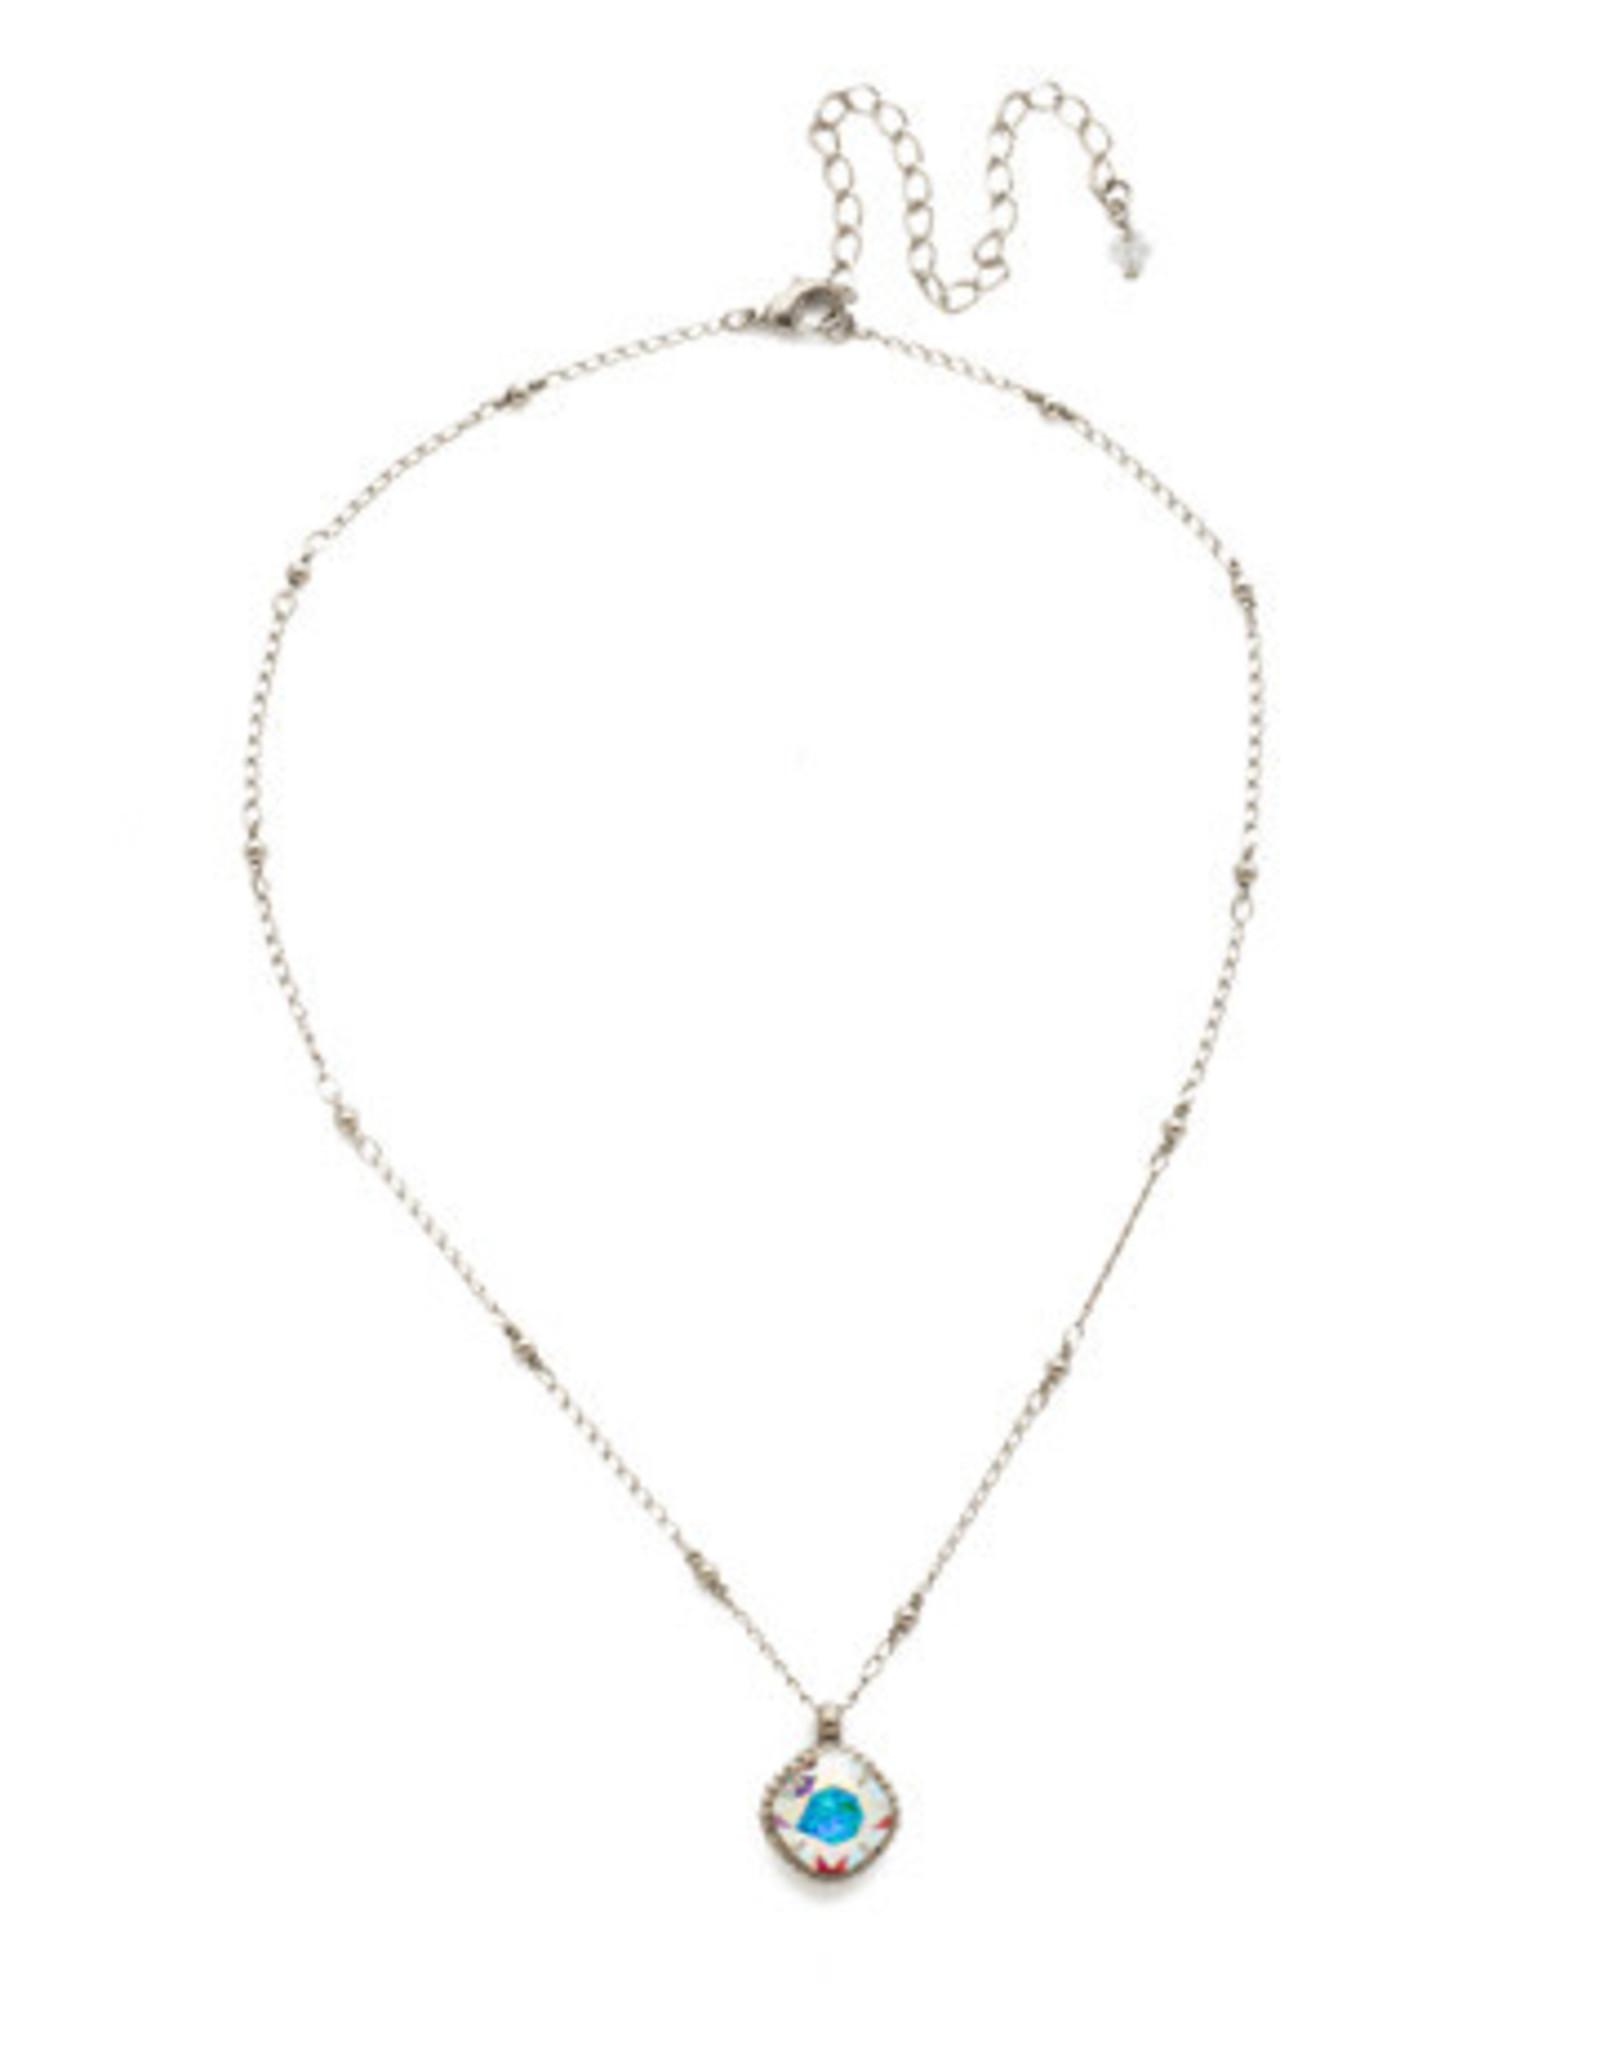 Sorrelli NDS50ASCAB - Crystal Aurora Borealis Cushion-Cut Solitaire Necklace